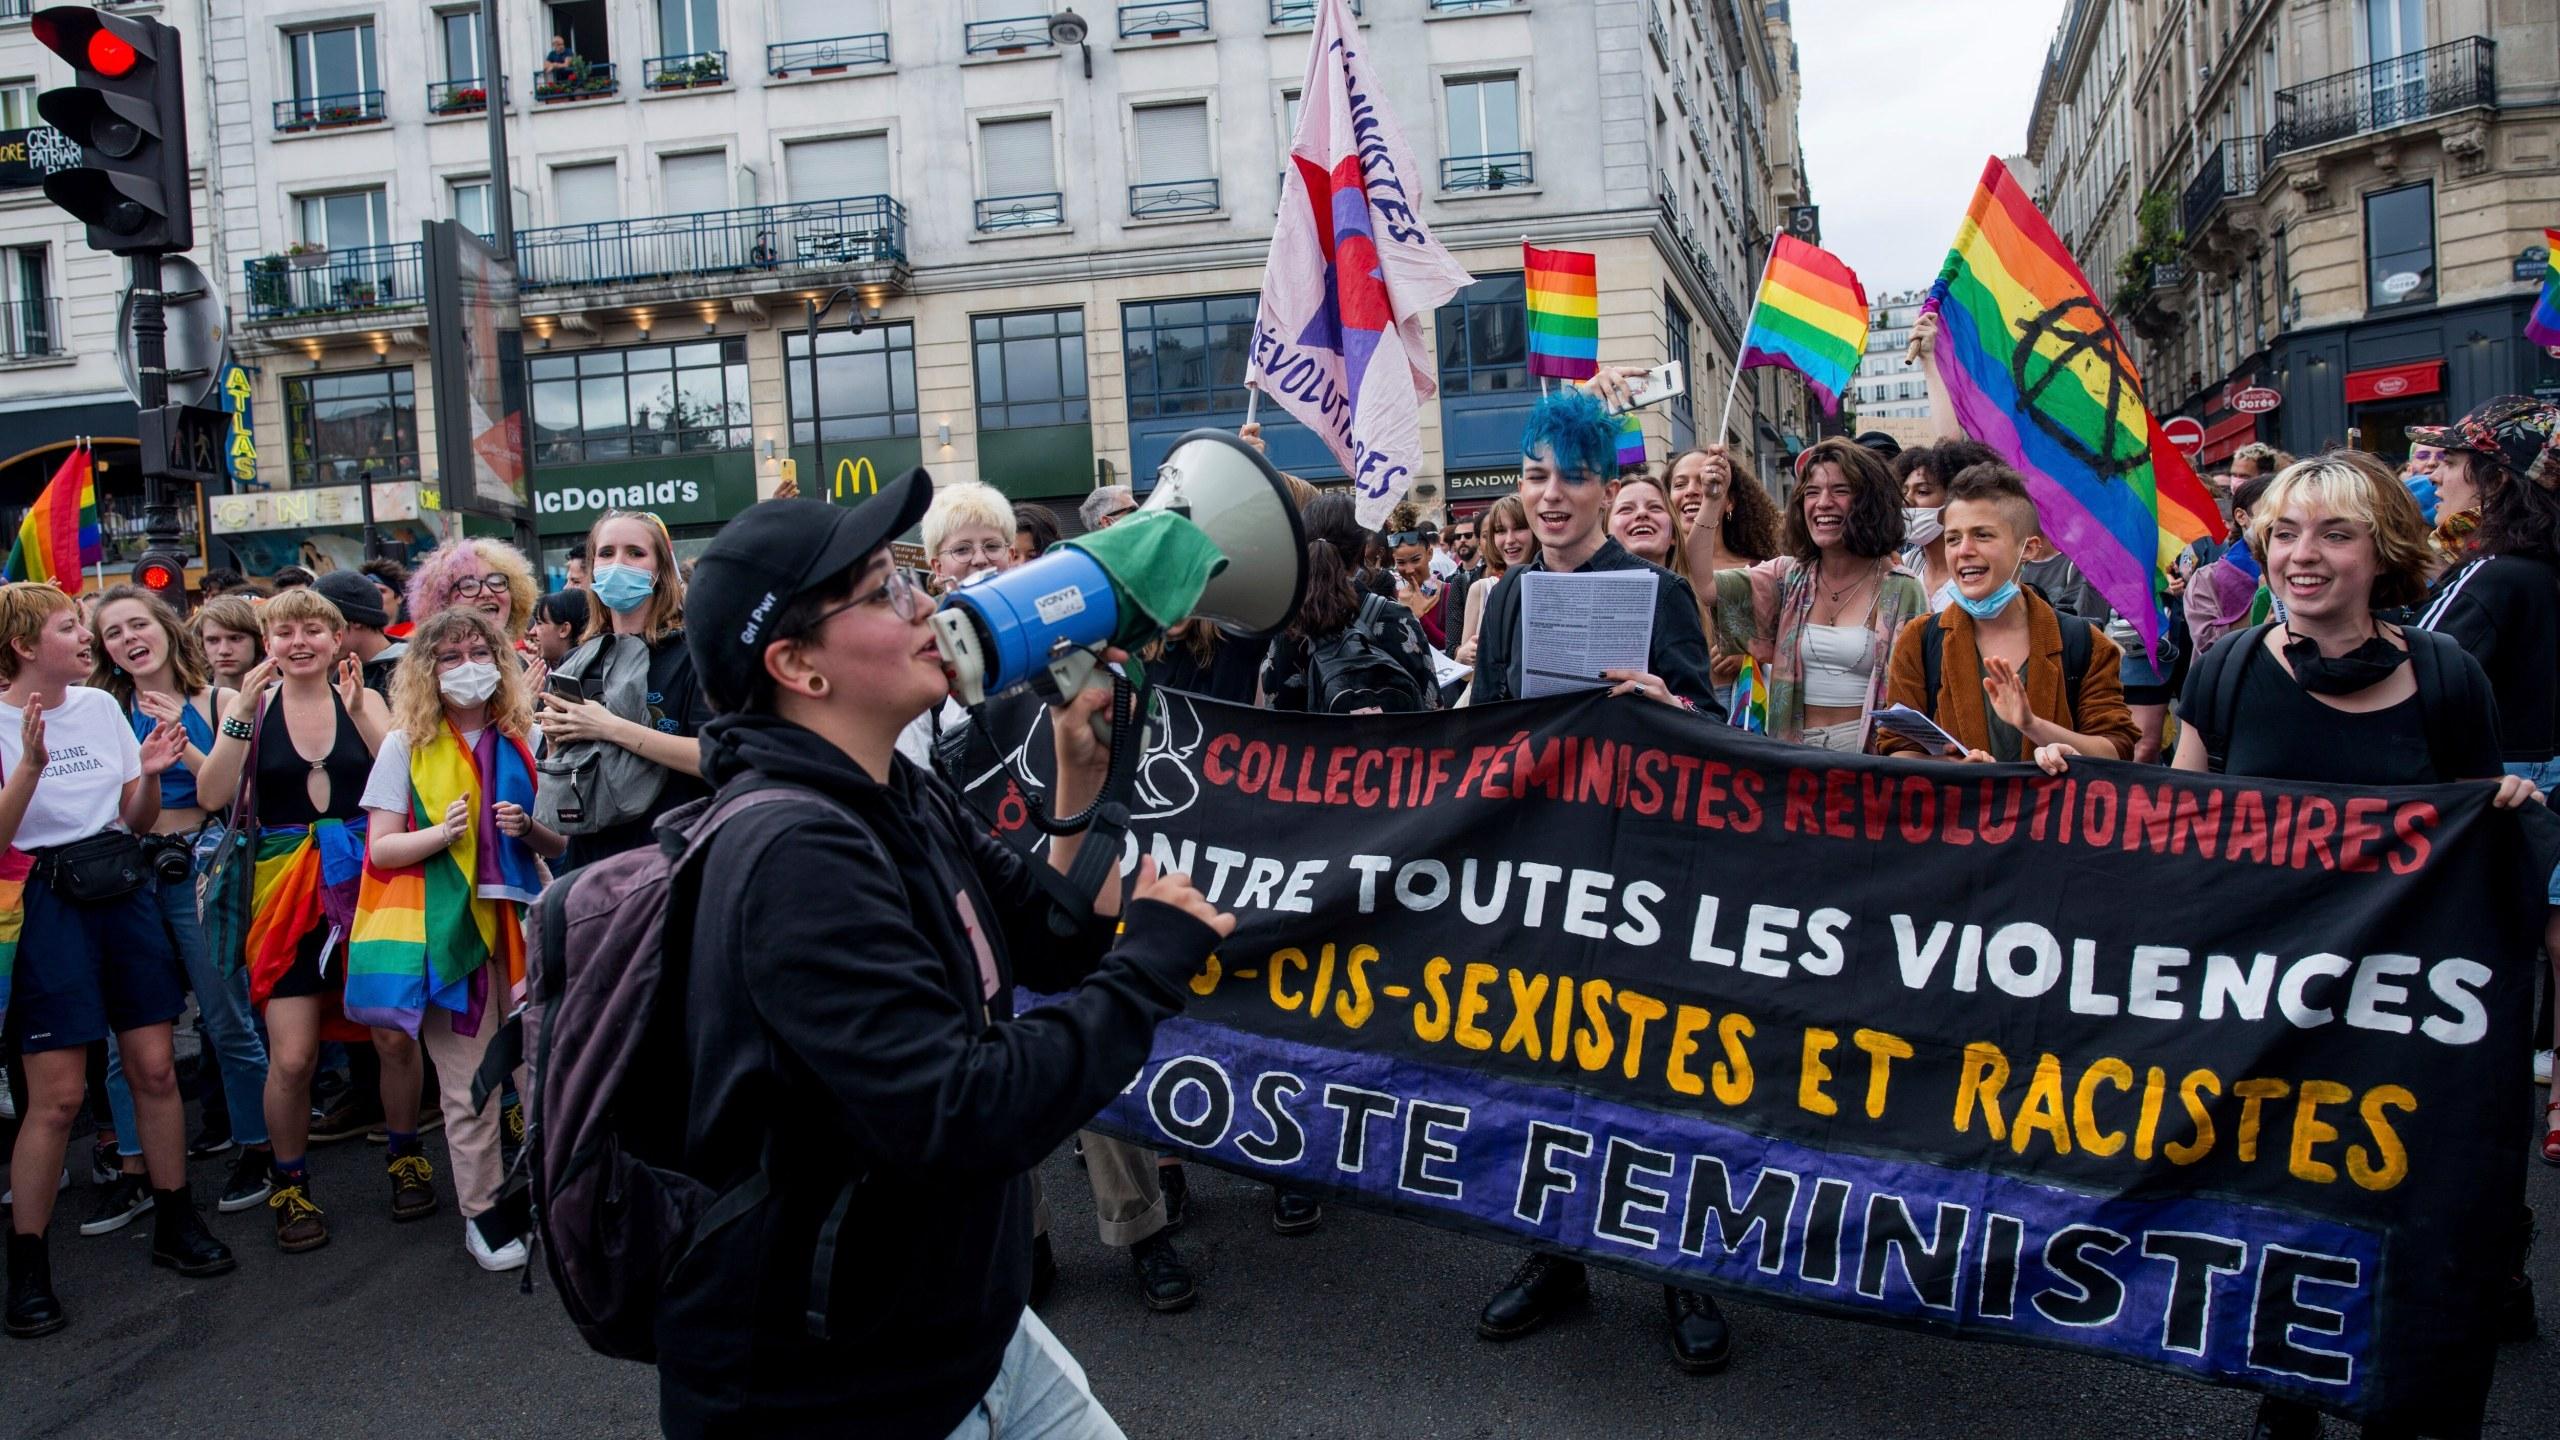 FRANCE GAY PRIDE